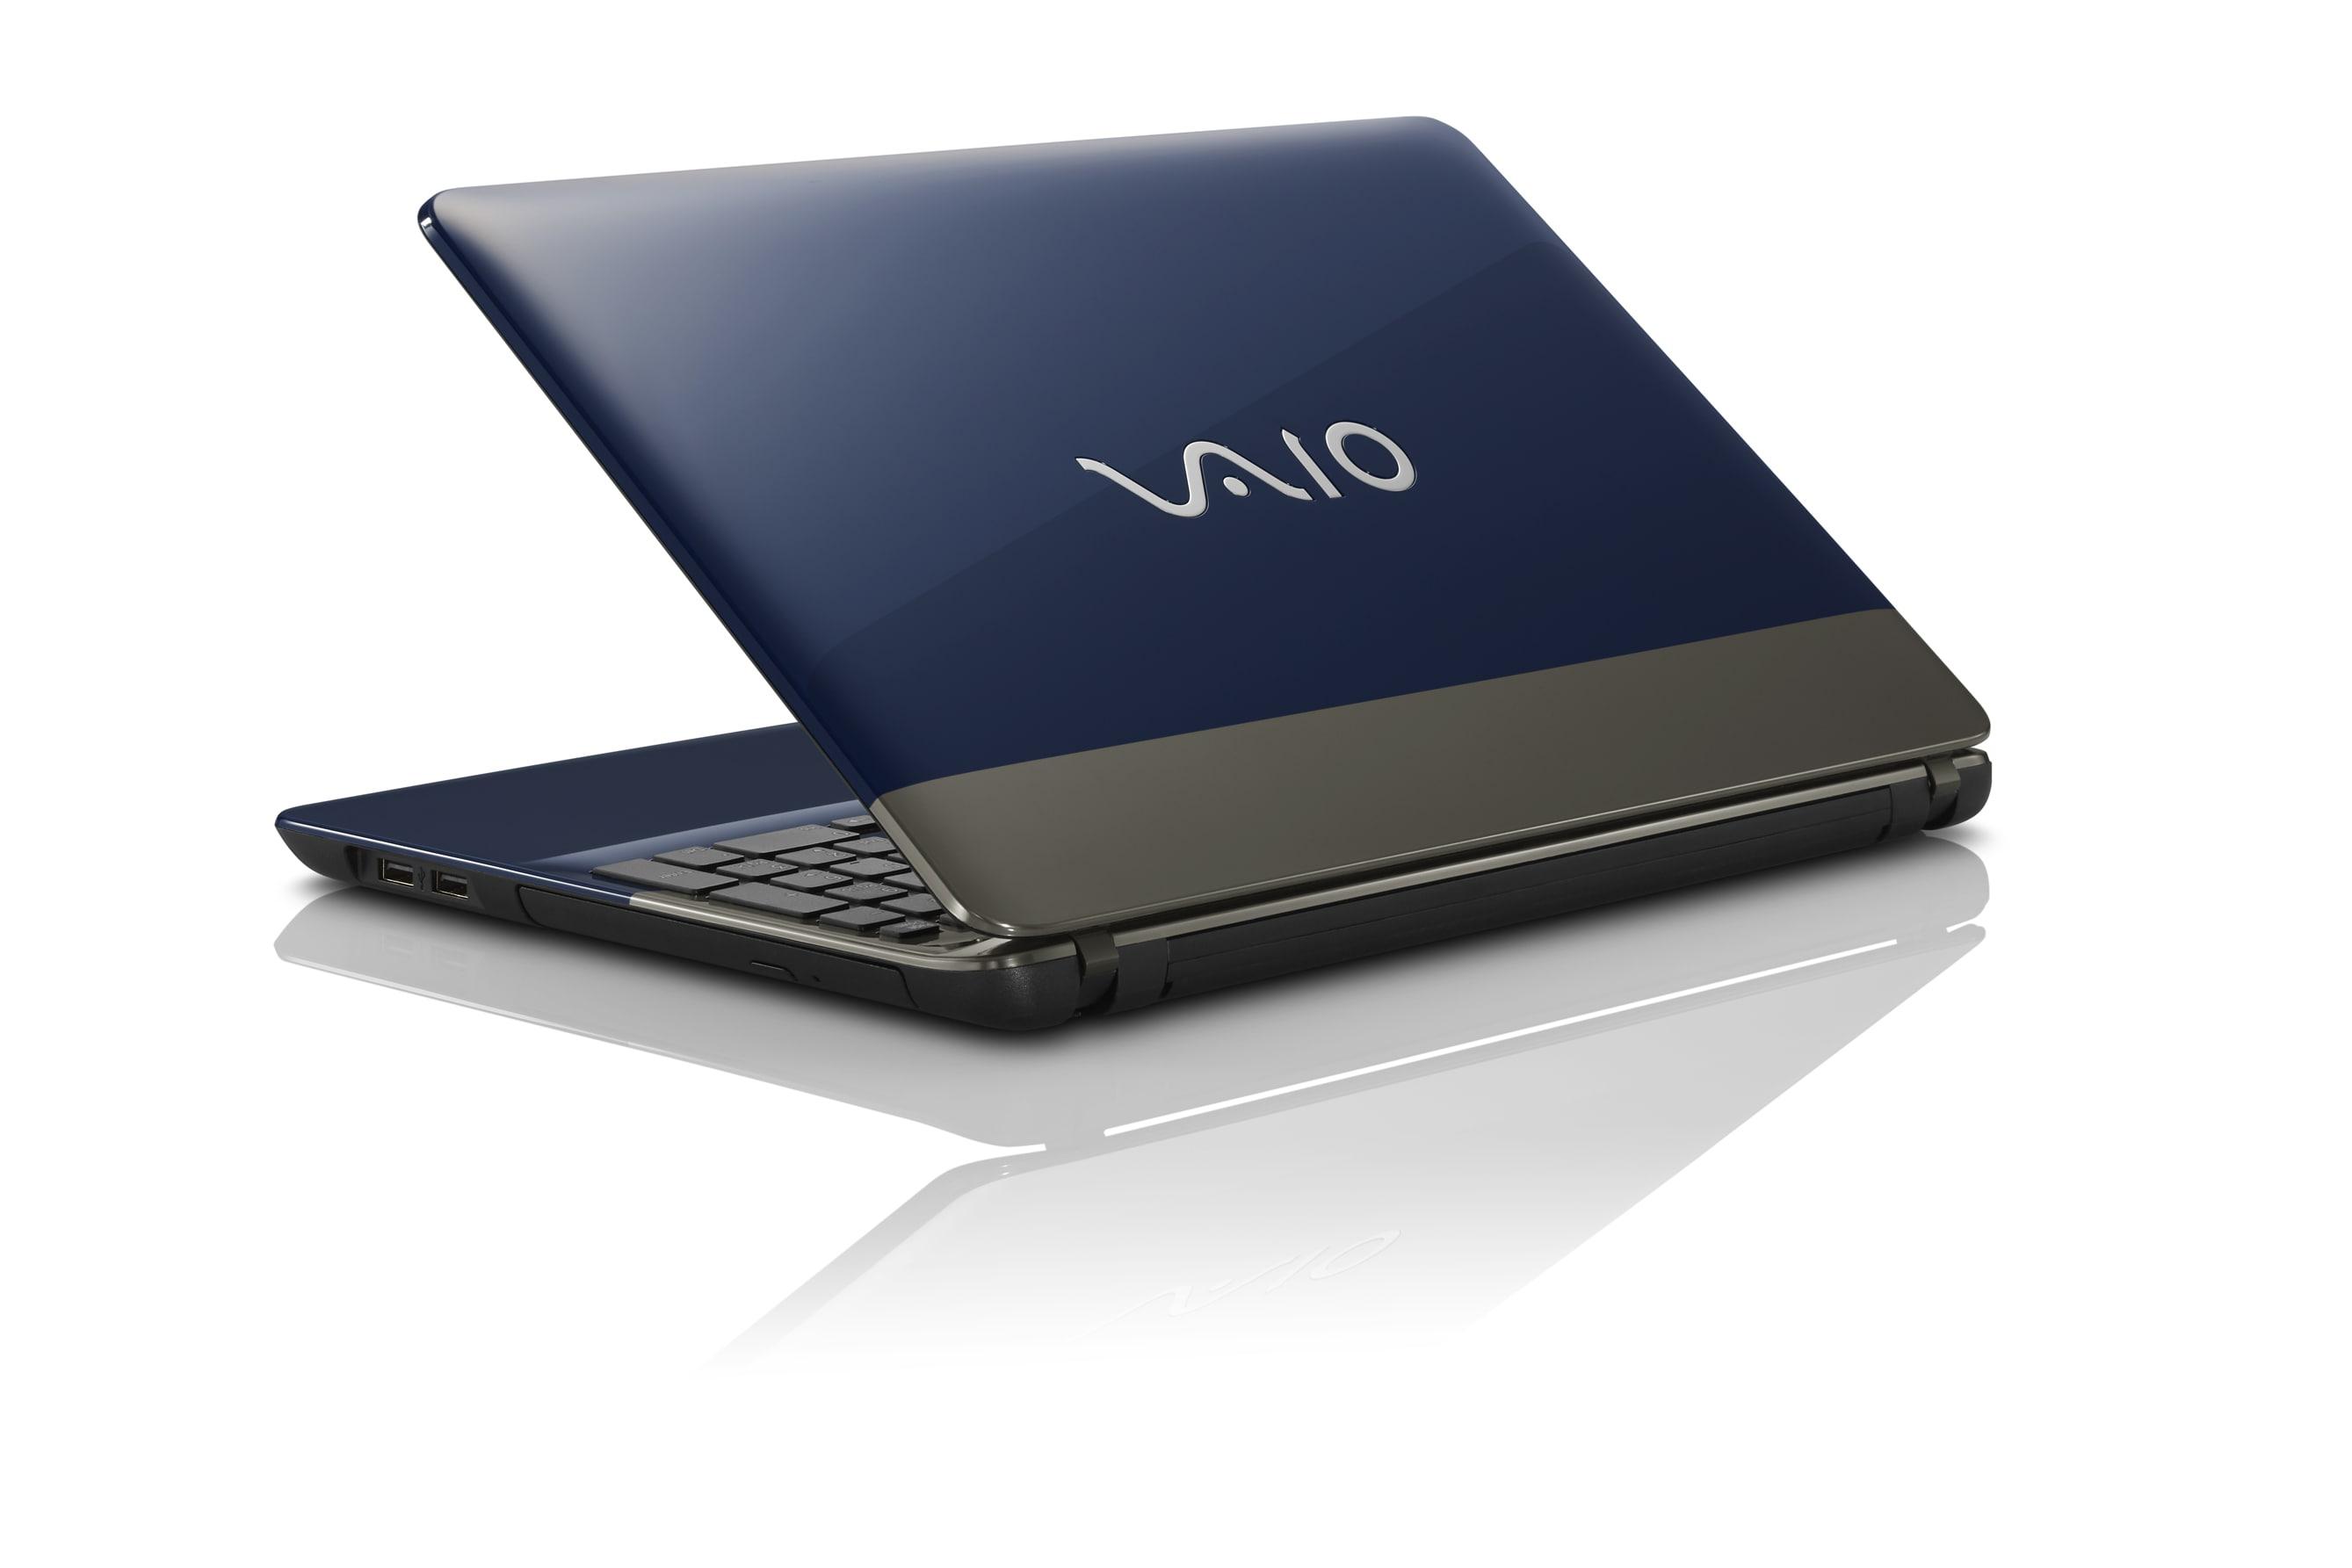 VJC1518(アウトレット新品 1年保証)在庫限定